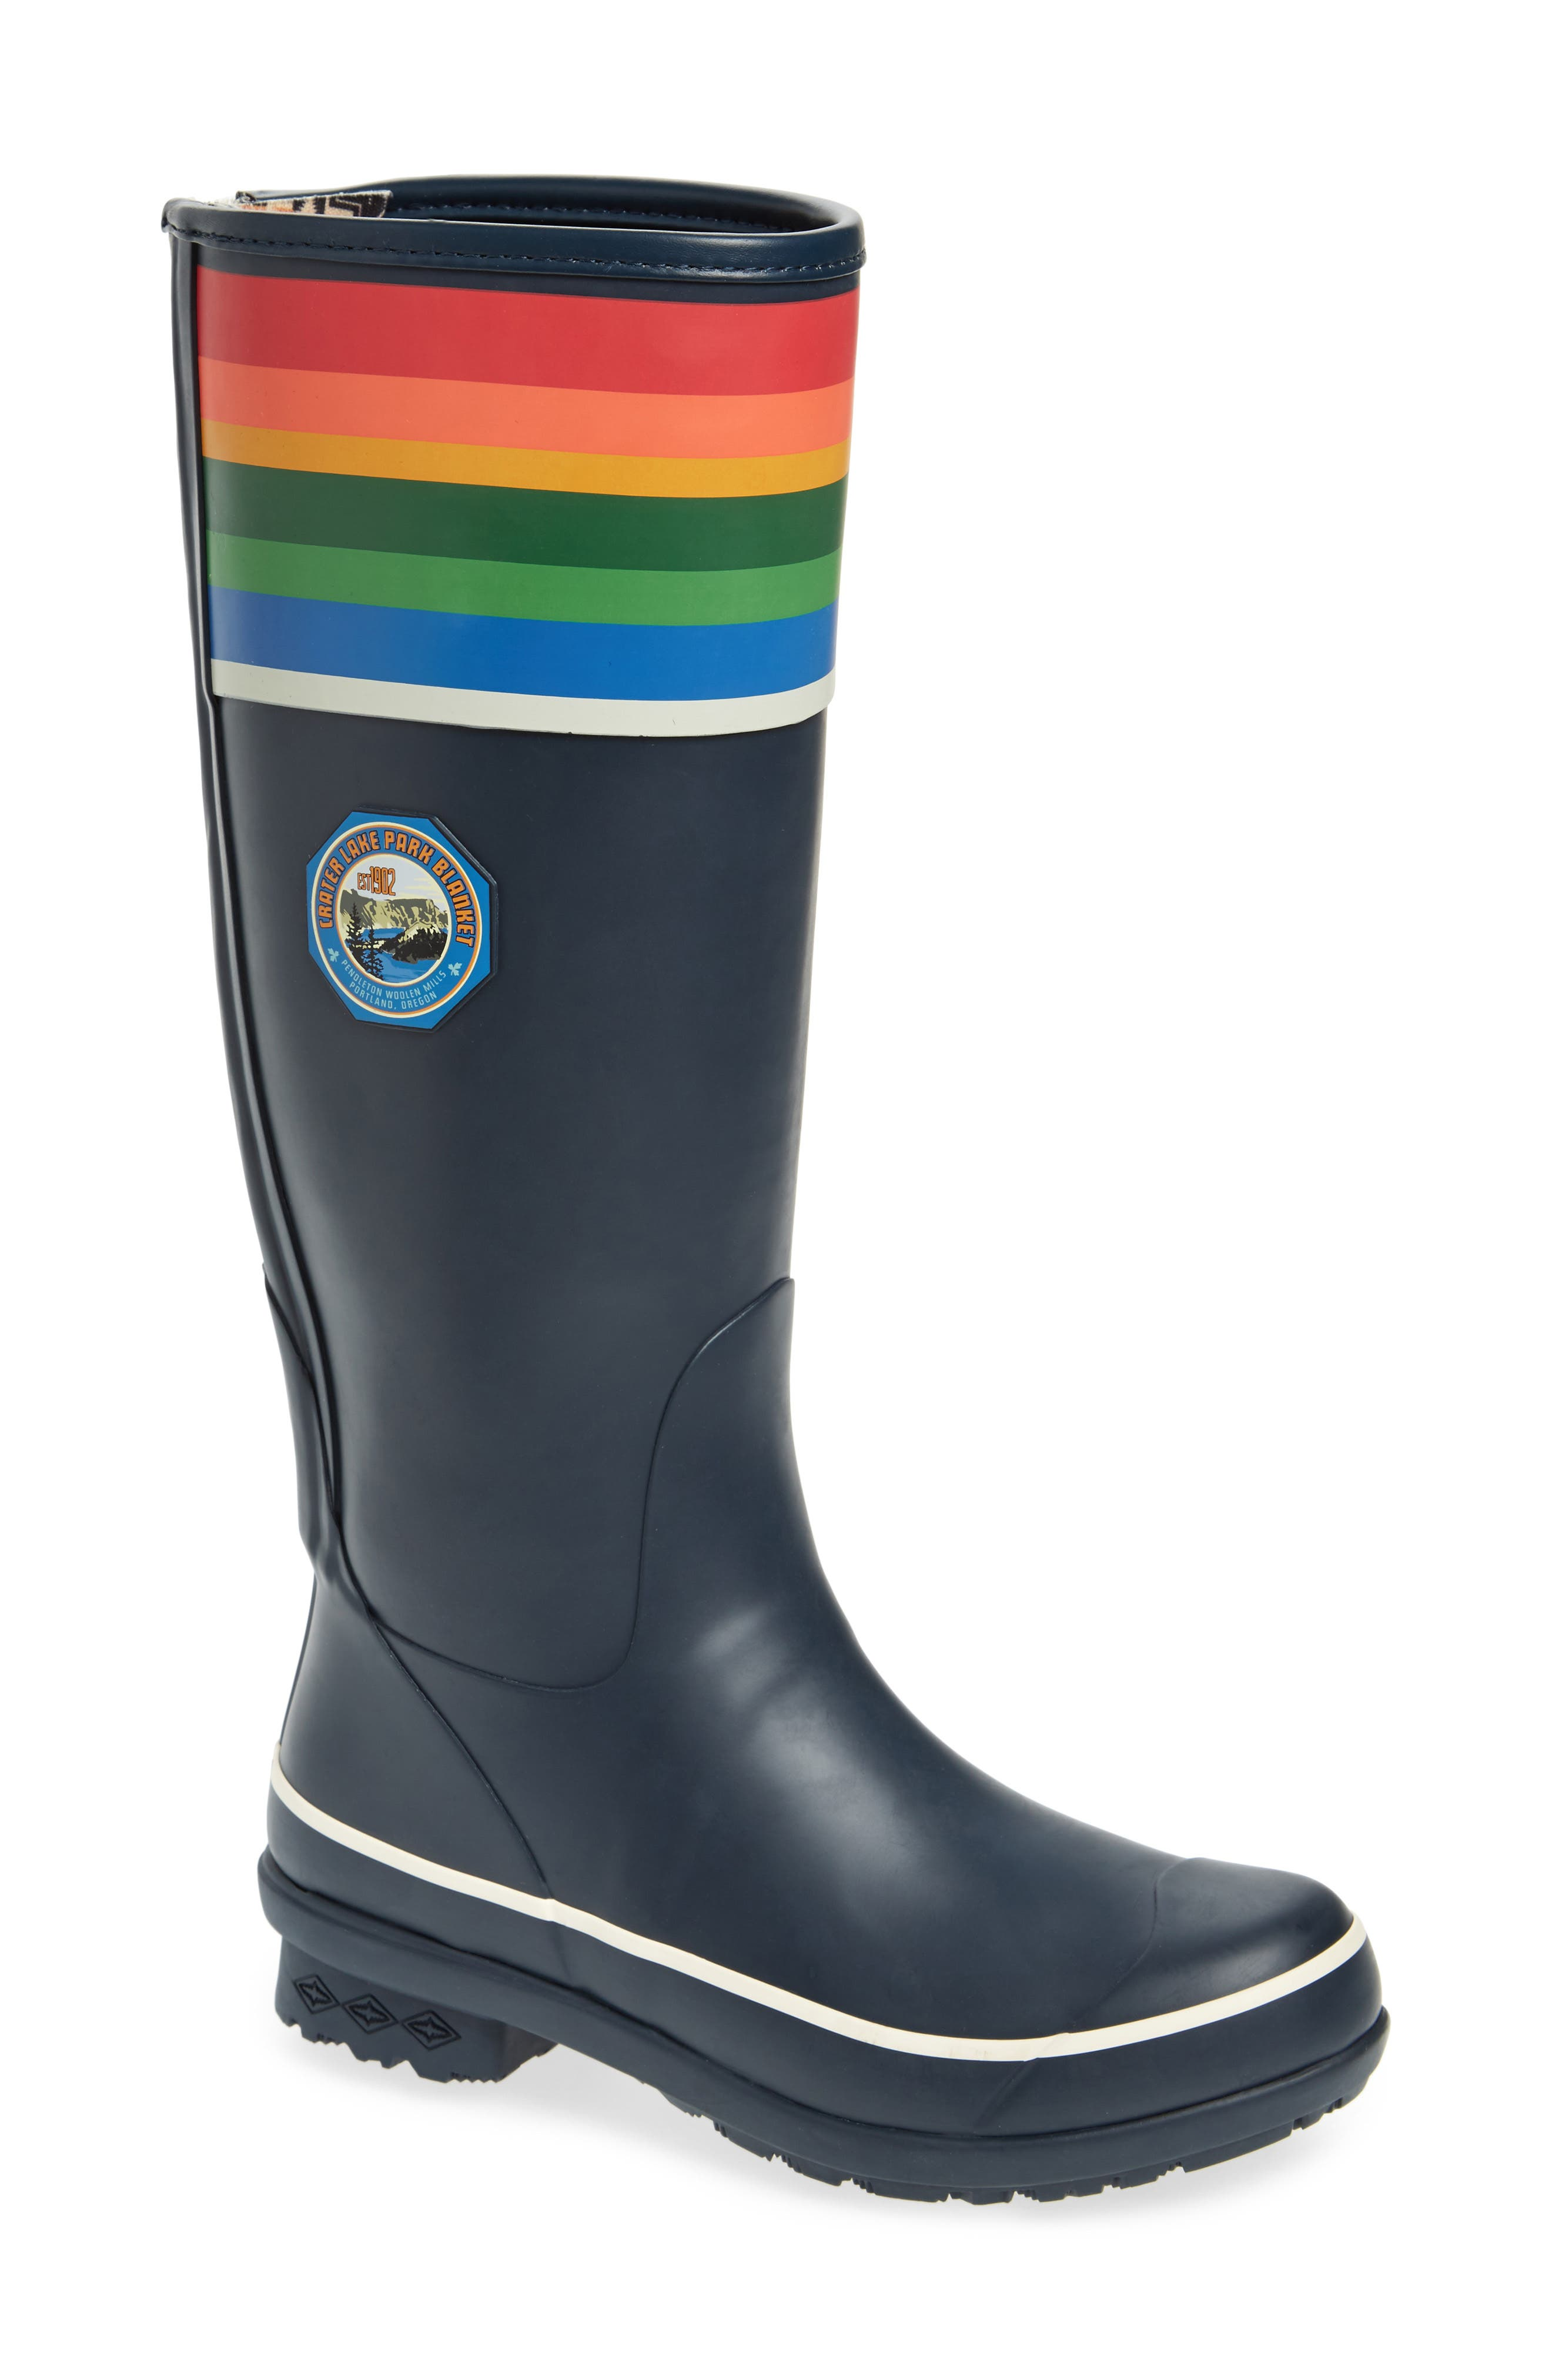 Pendleton Crater Lake National Park Tall Rain Boot,                         Main,                         color, Blue